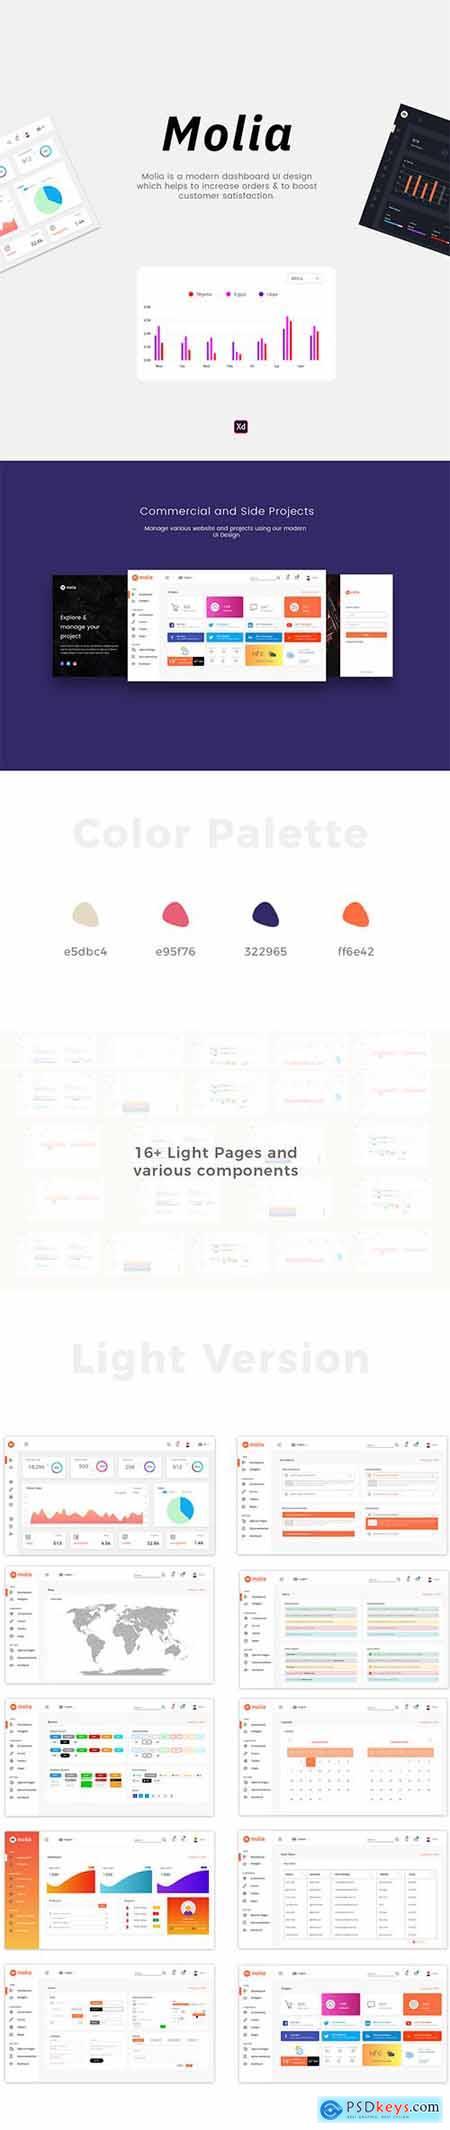 Molia Dashboard UI Kit